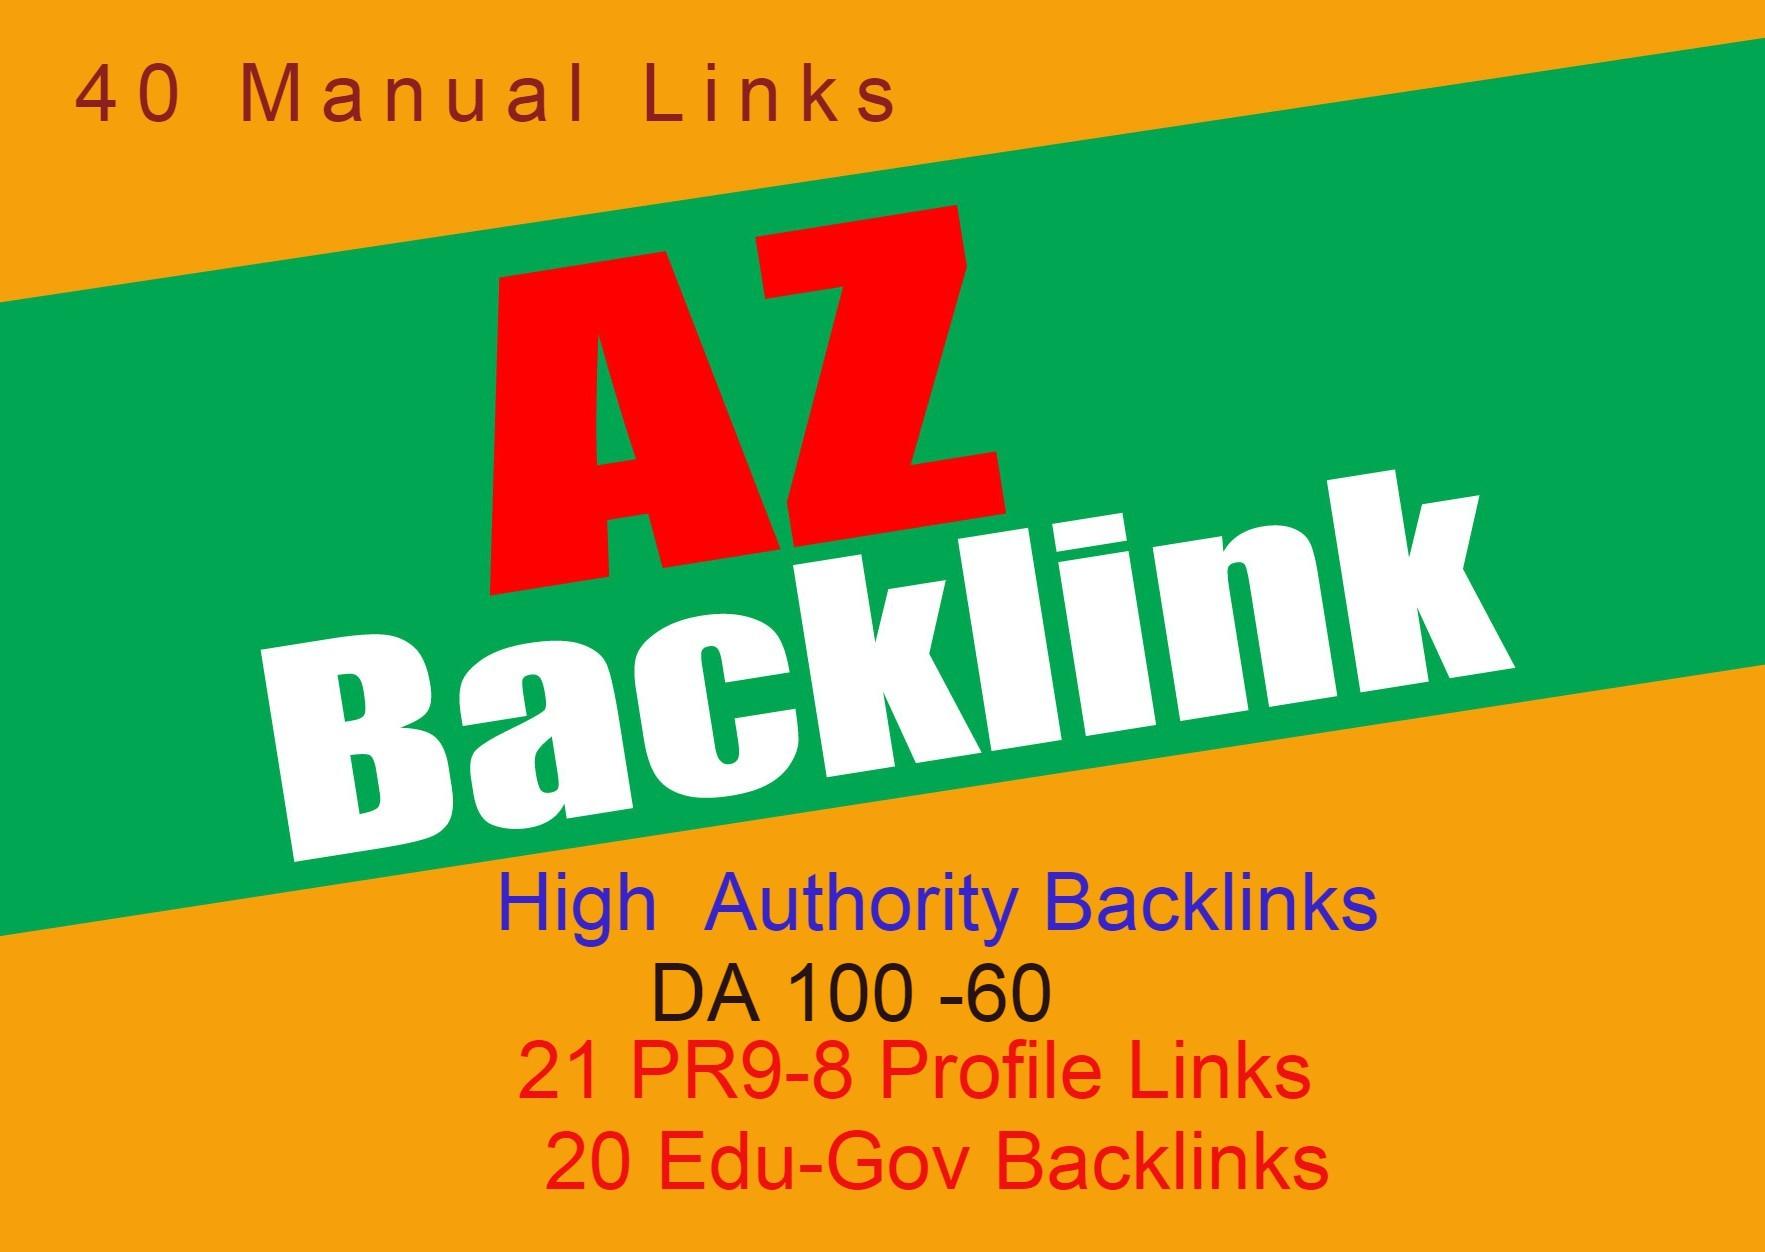 40 Authority Backlinks From 21 HQ Profile + 20 Edu-Gov Profile Links